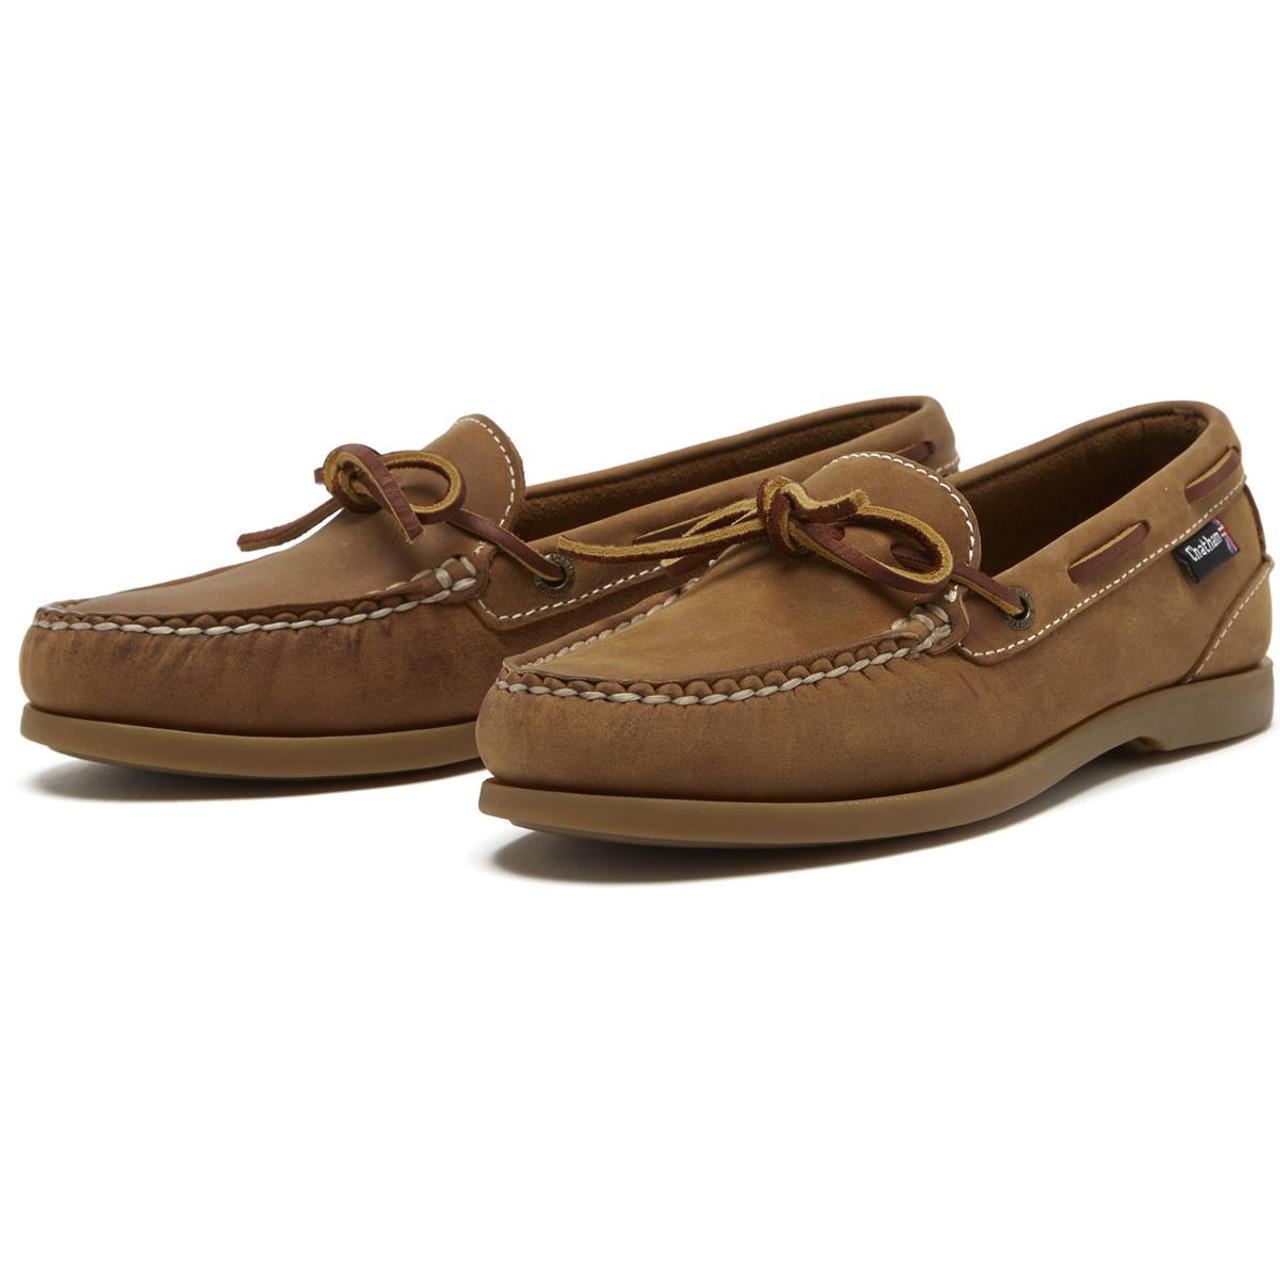 Chatham Womens Olivia G2 Deck Shoes